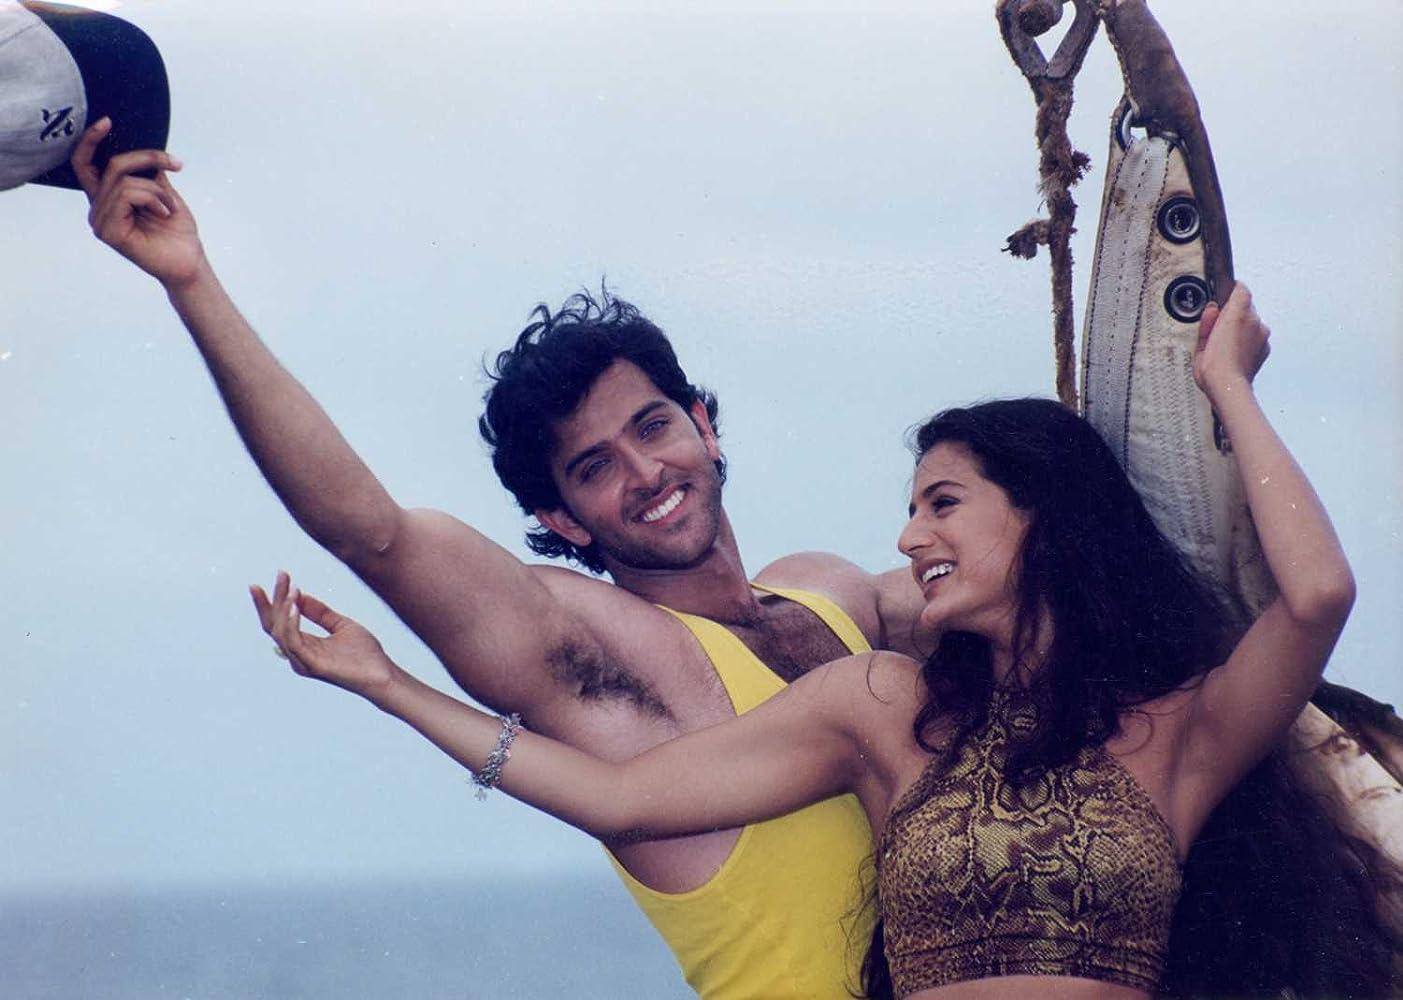 Hrithik Roshan and Ameesha Patel in Kaho Naa... Pyaar Hai (2000)